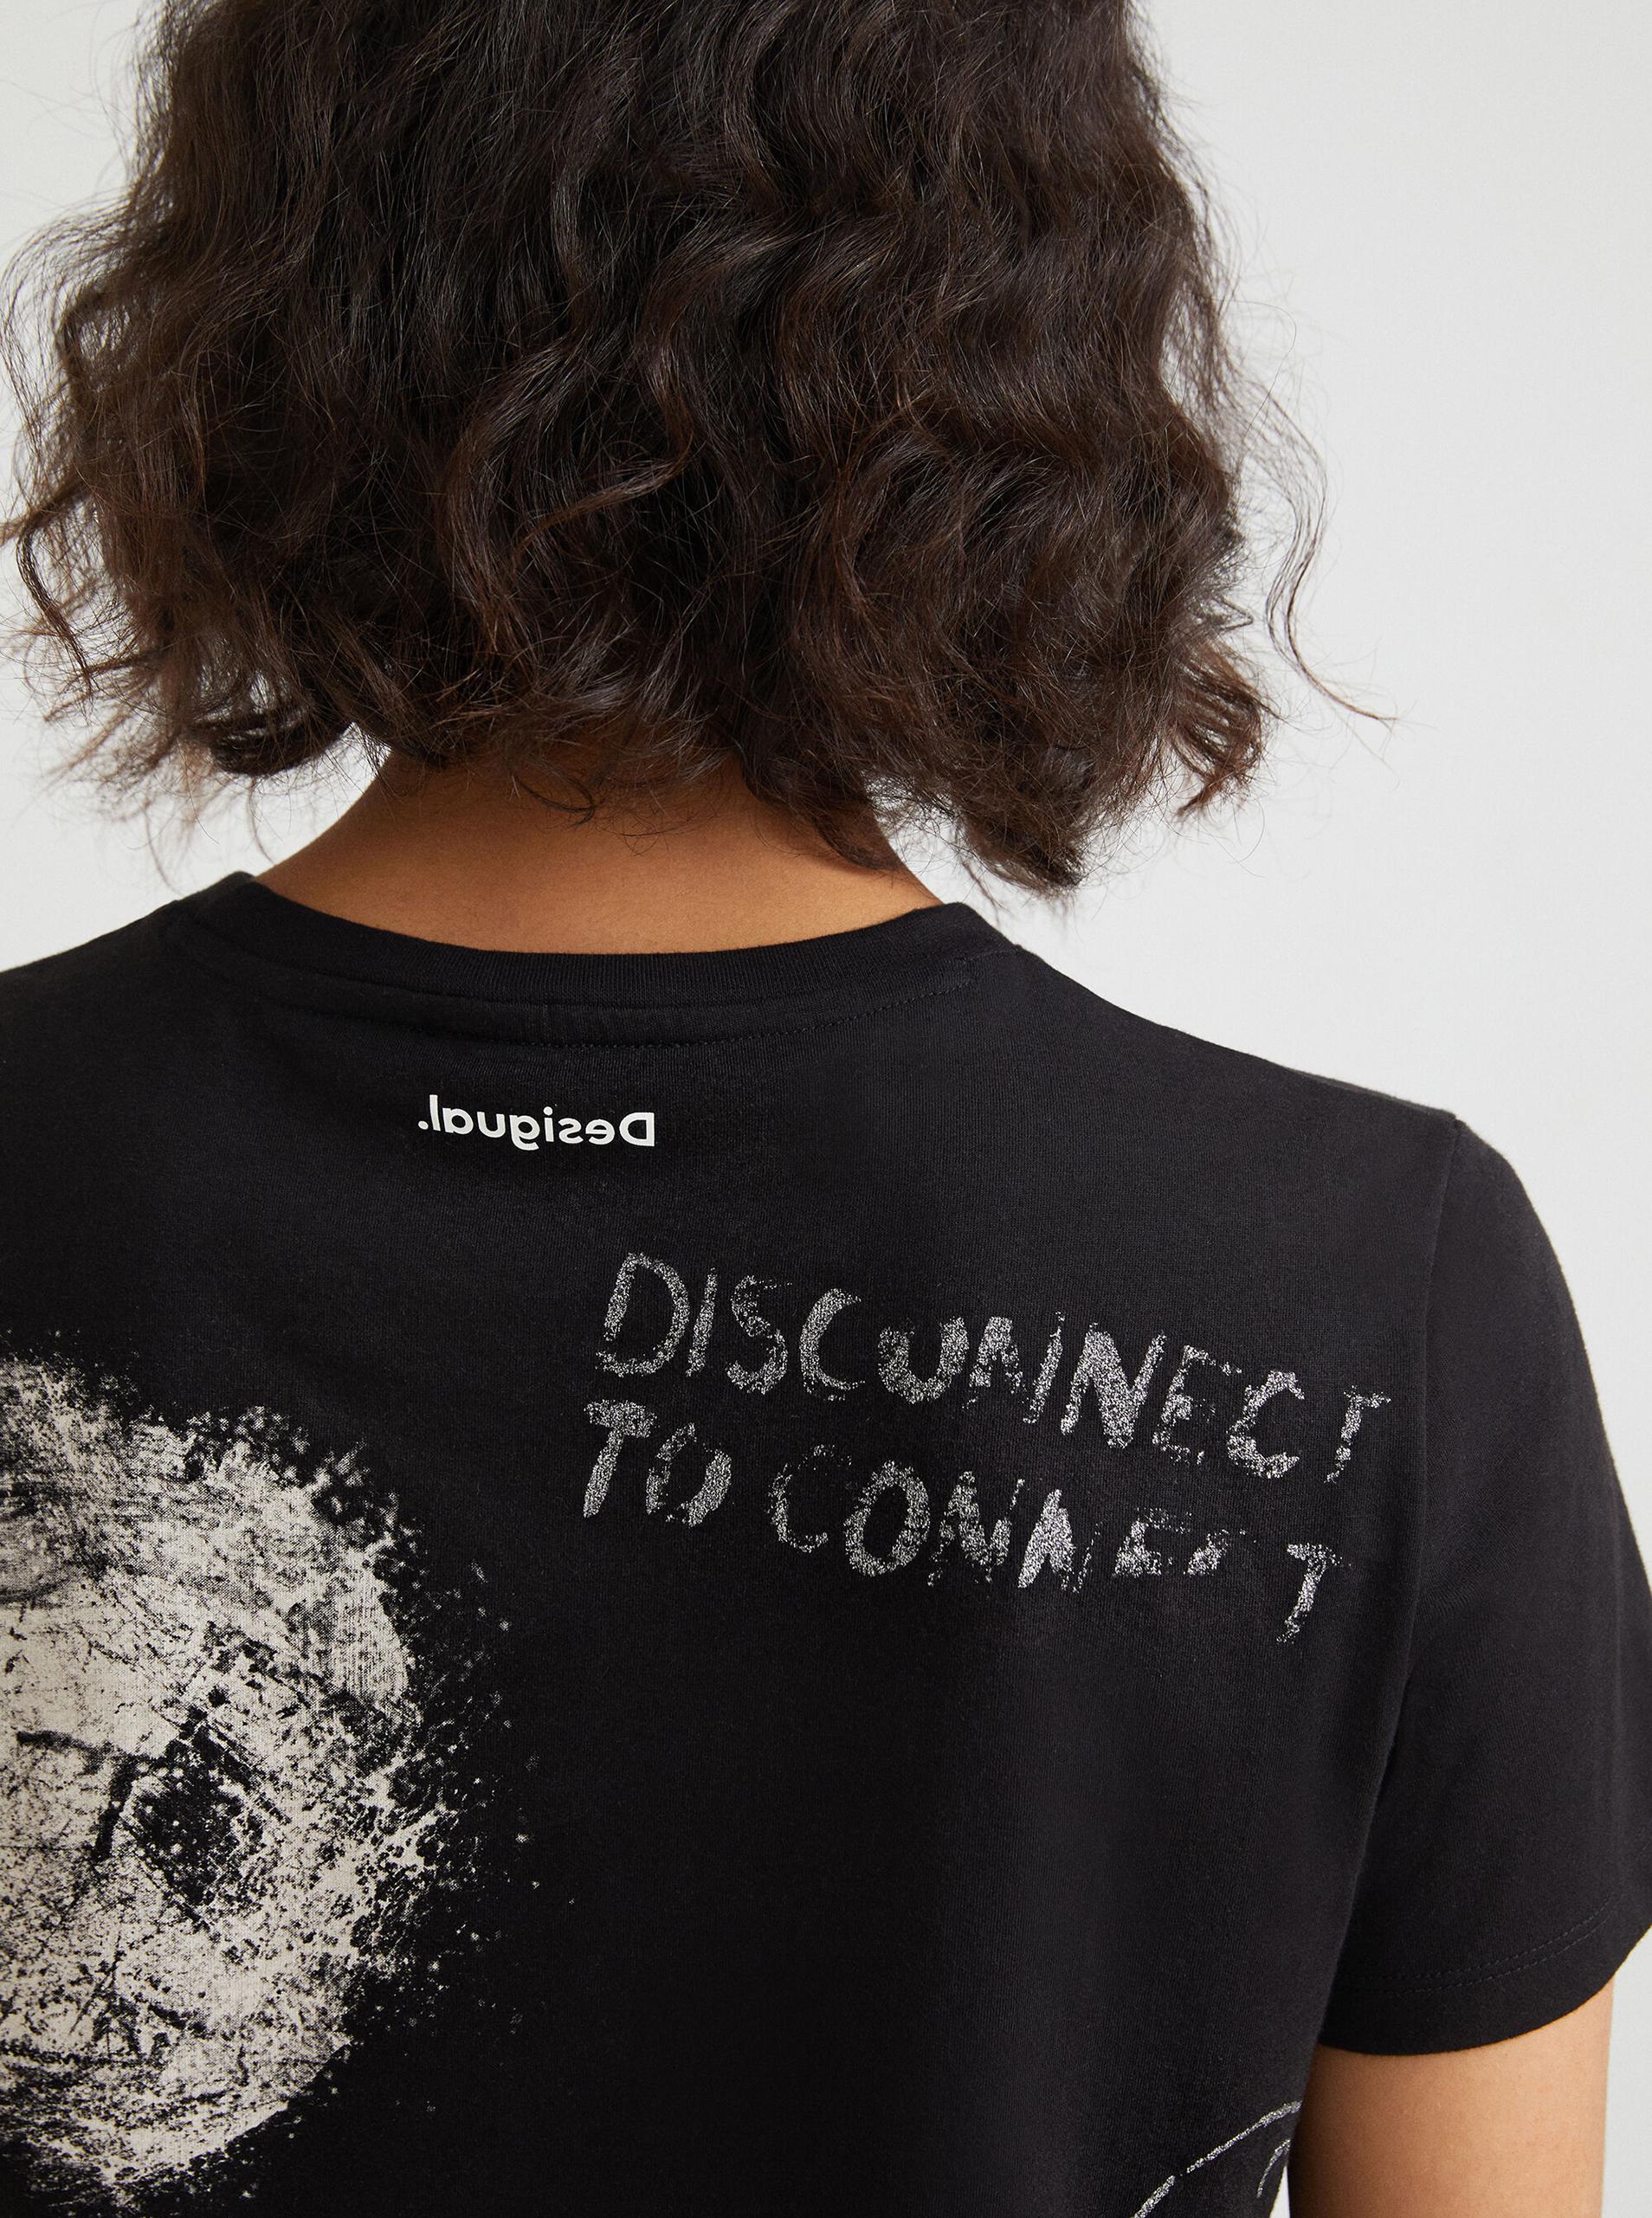 Desigual crna majica Desigual Mickey